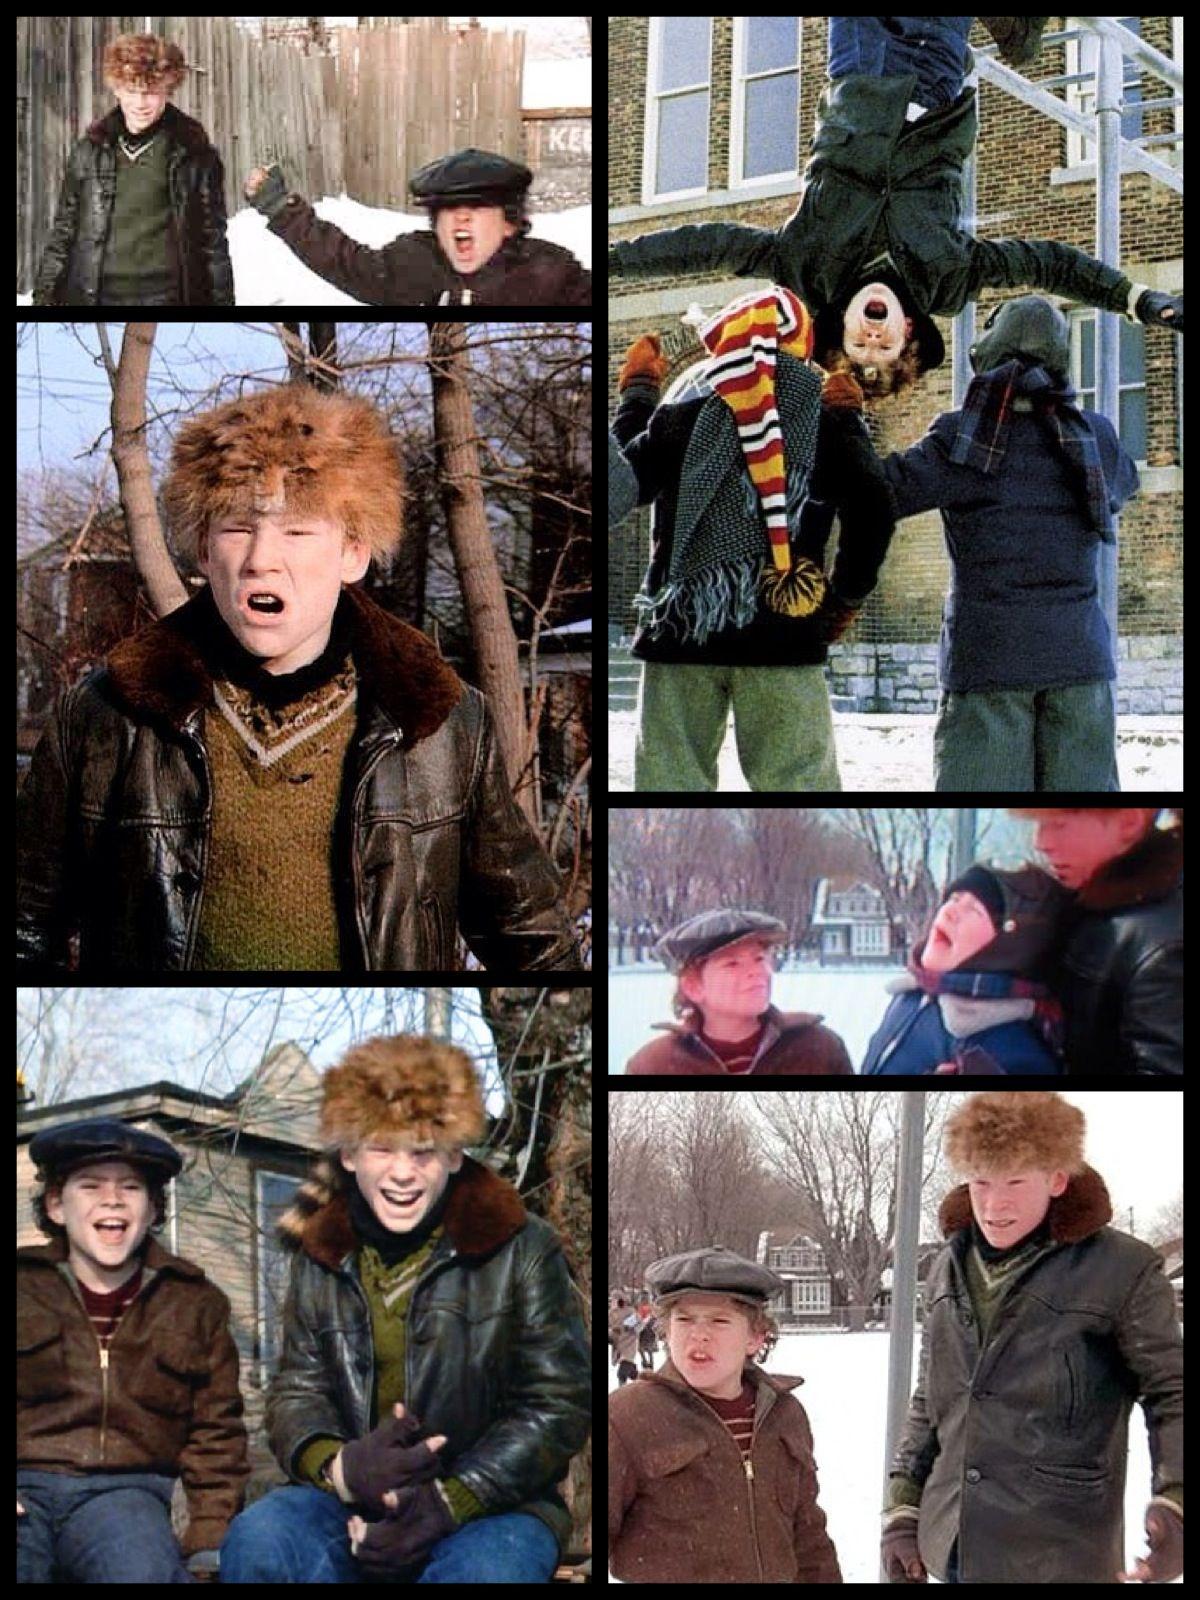 Christmas Story Bully.A Christmas Story 1983 The Bullies Scut Farkus What A